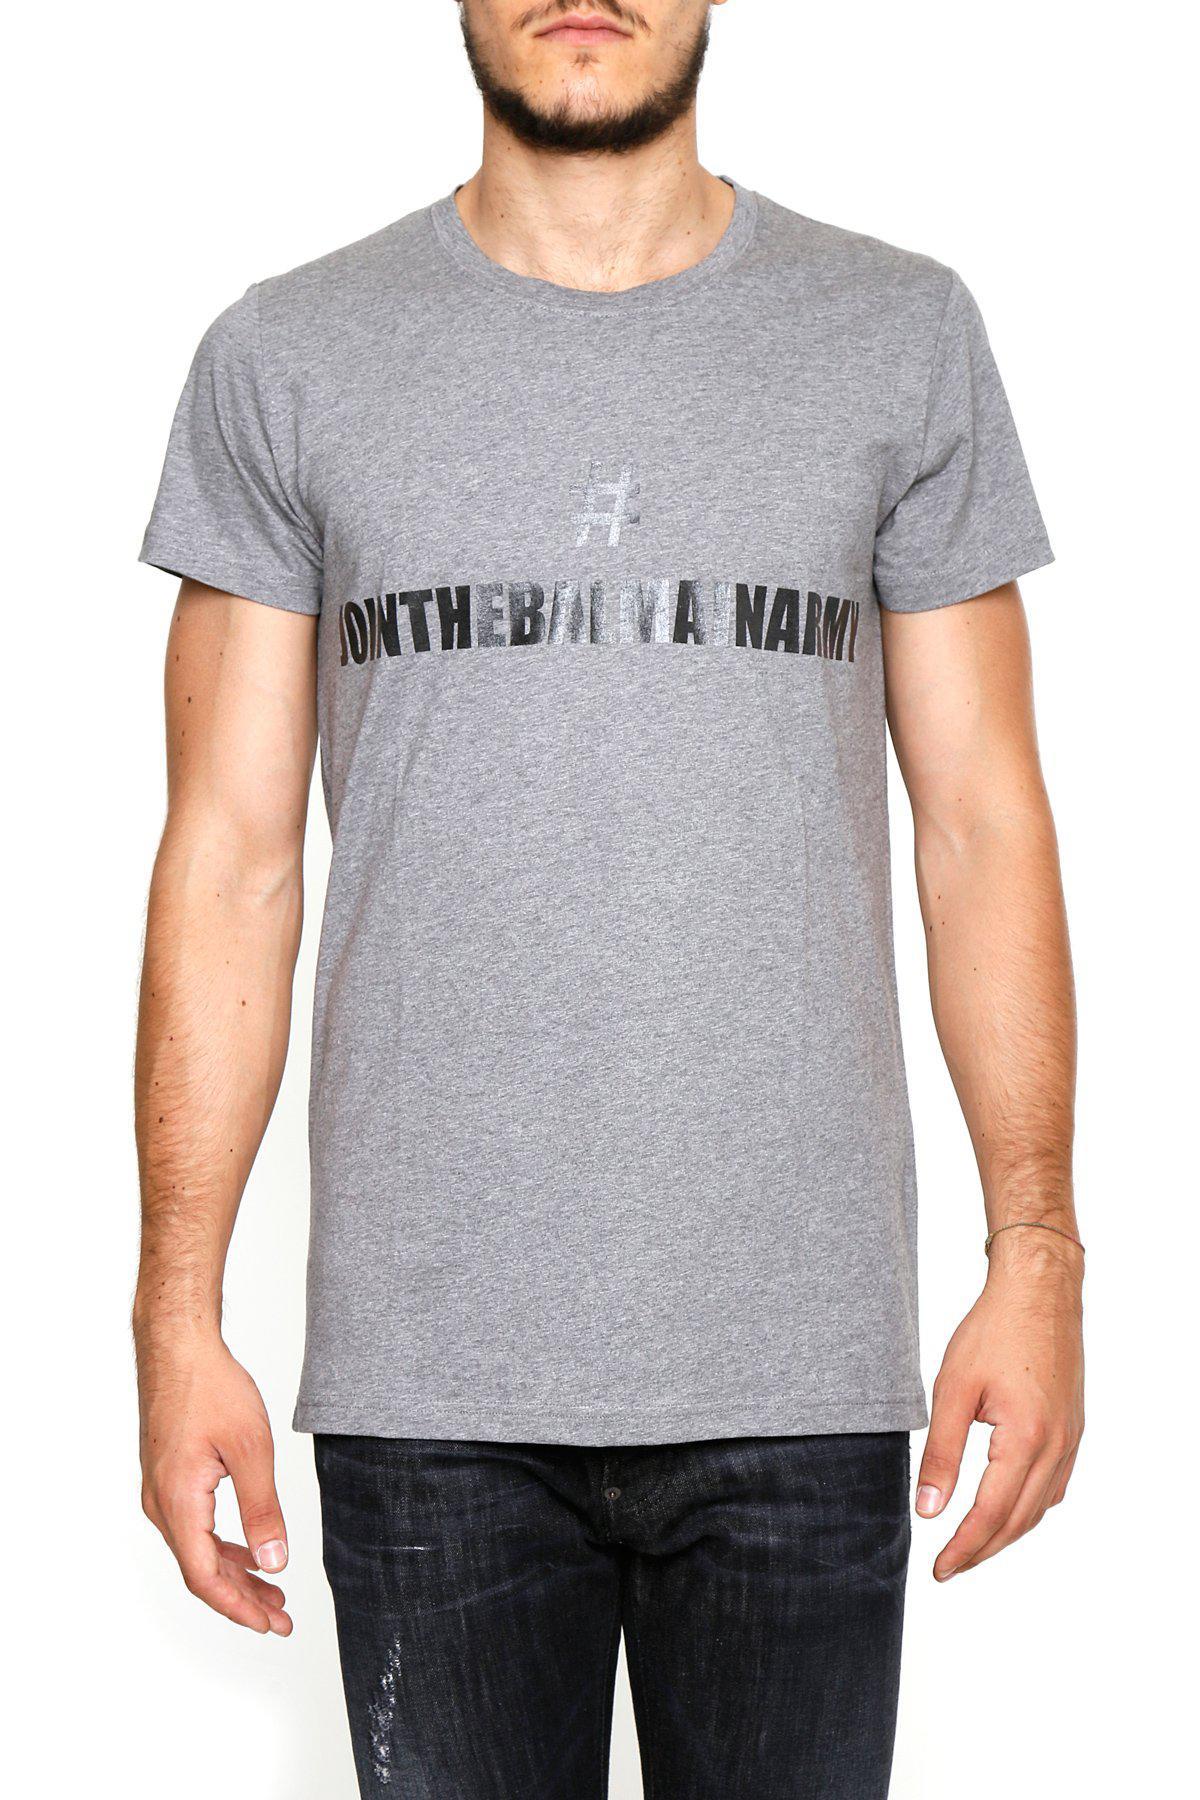 0f6a9ff4 Balmain Logo T-shirt in Gray for Men - Lyst